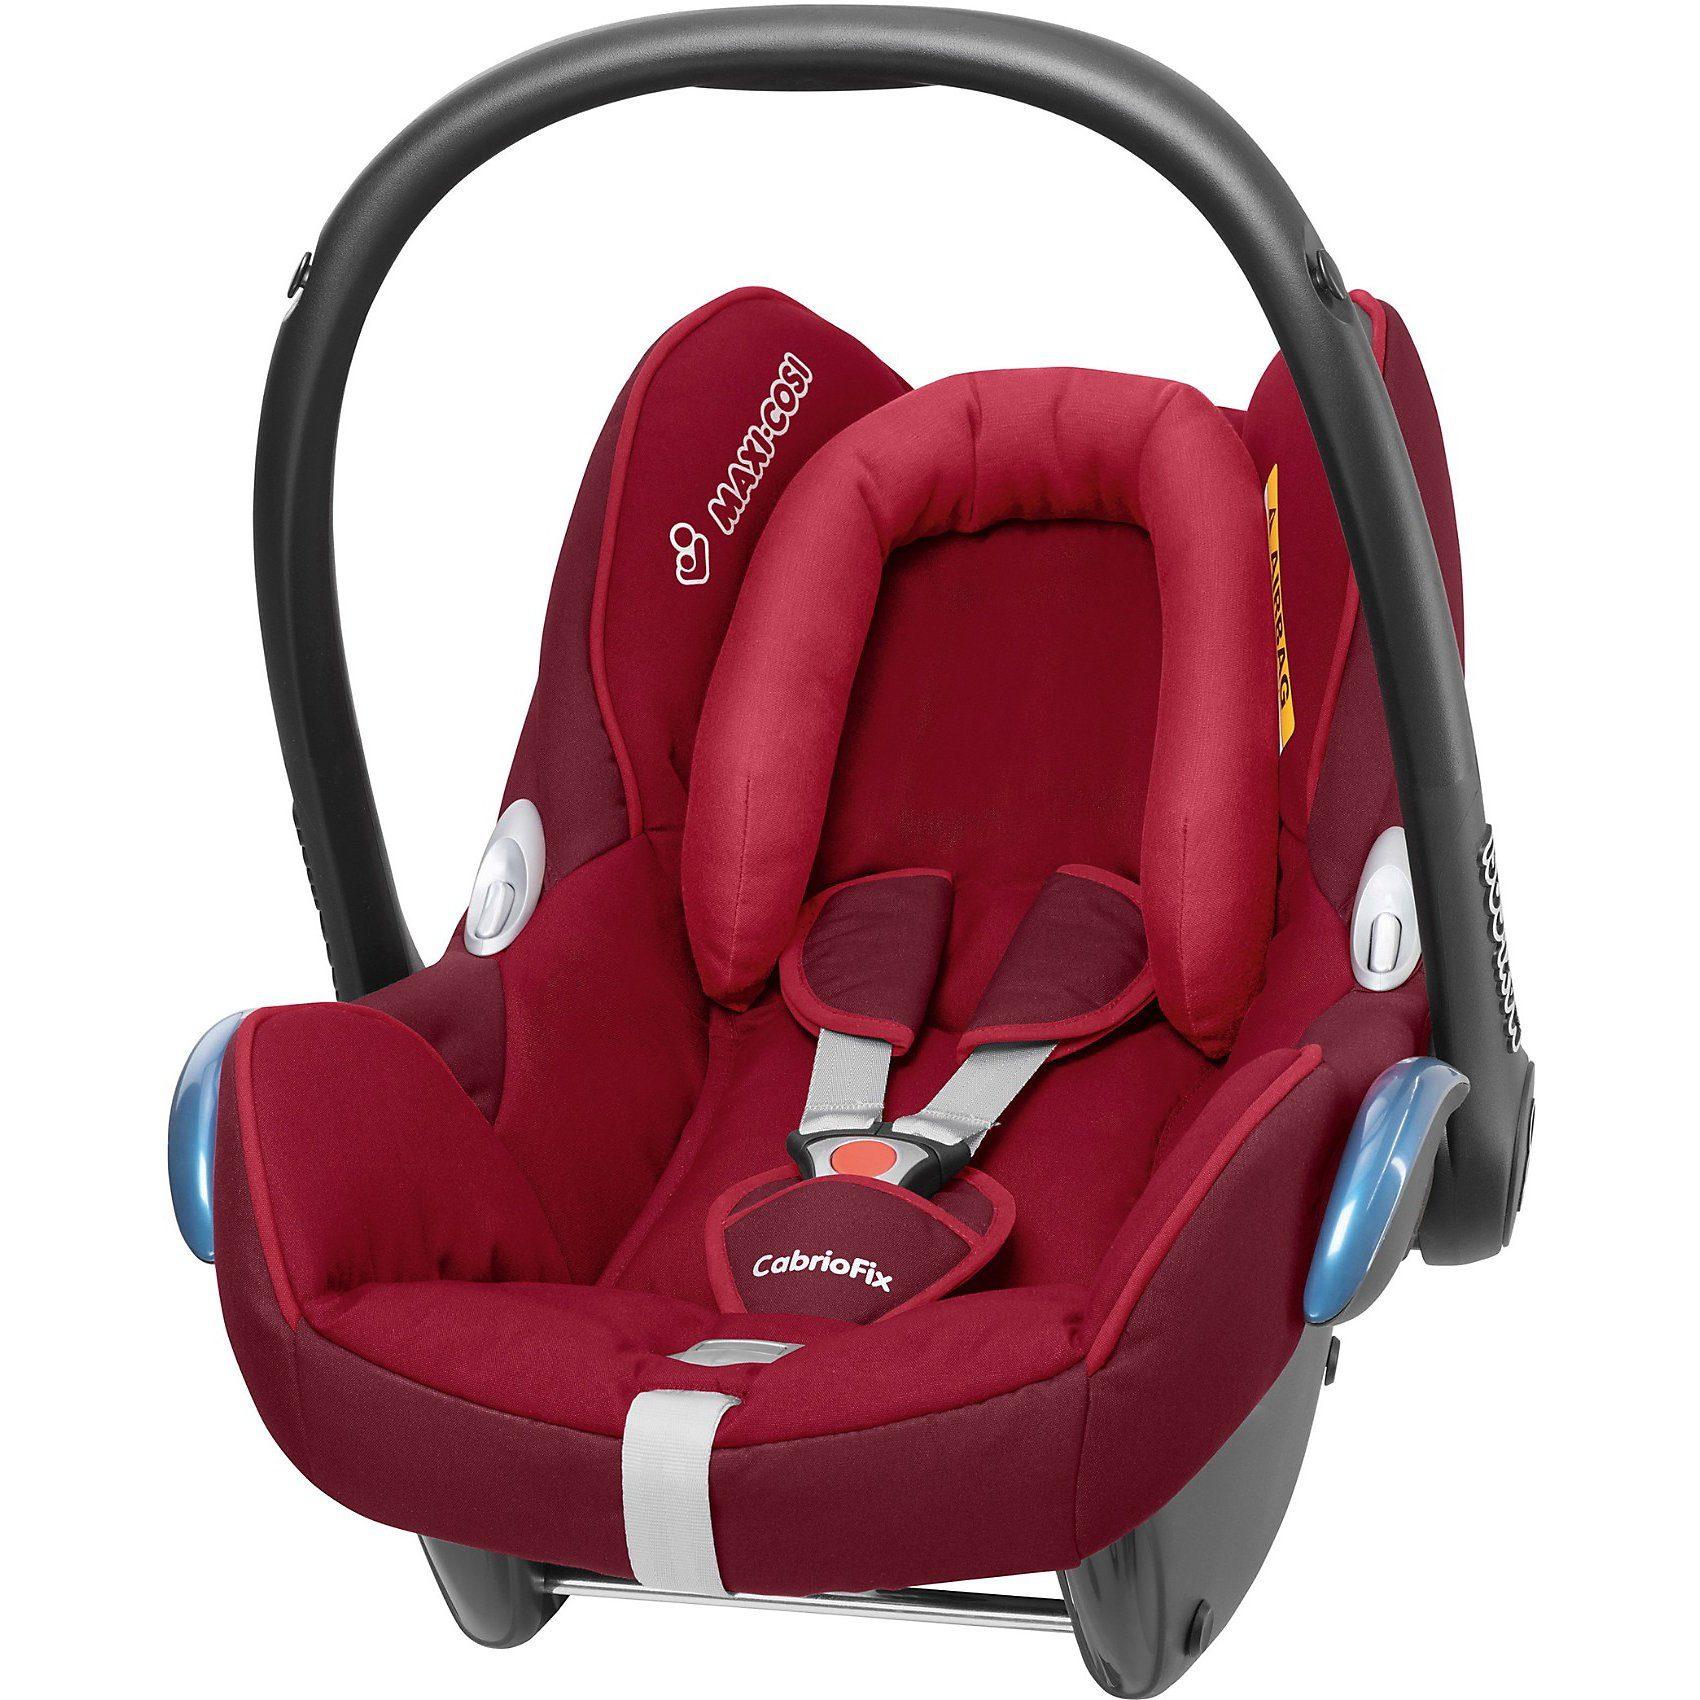 Maxi-Cosi Babyschale Cabriofix, Raspberry Red, 2015